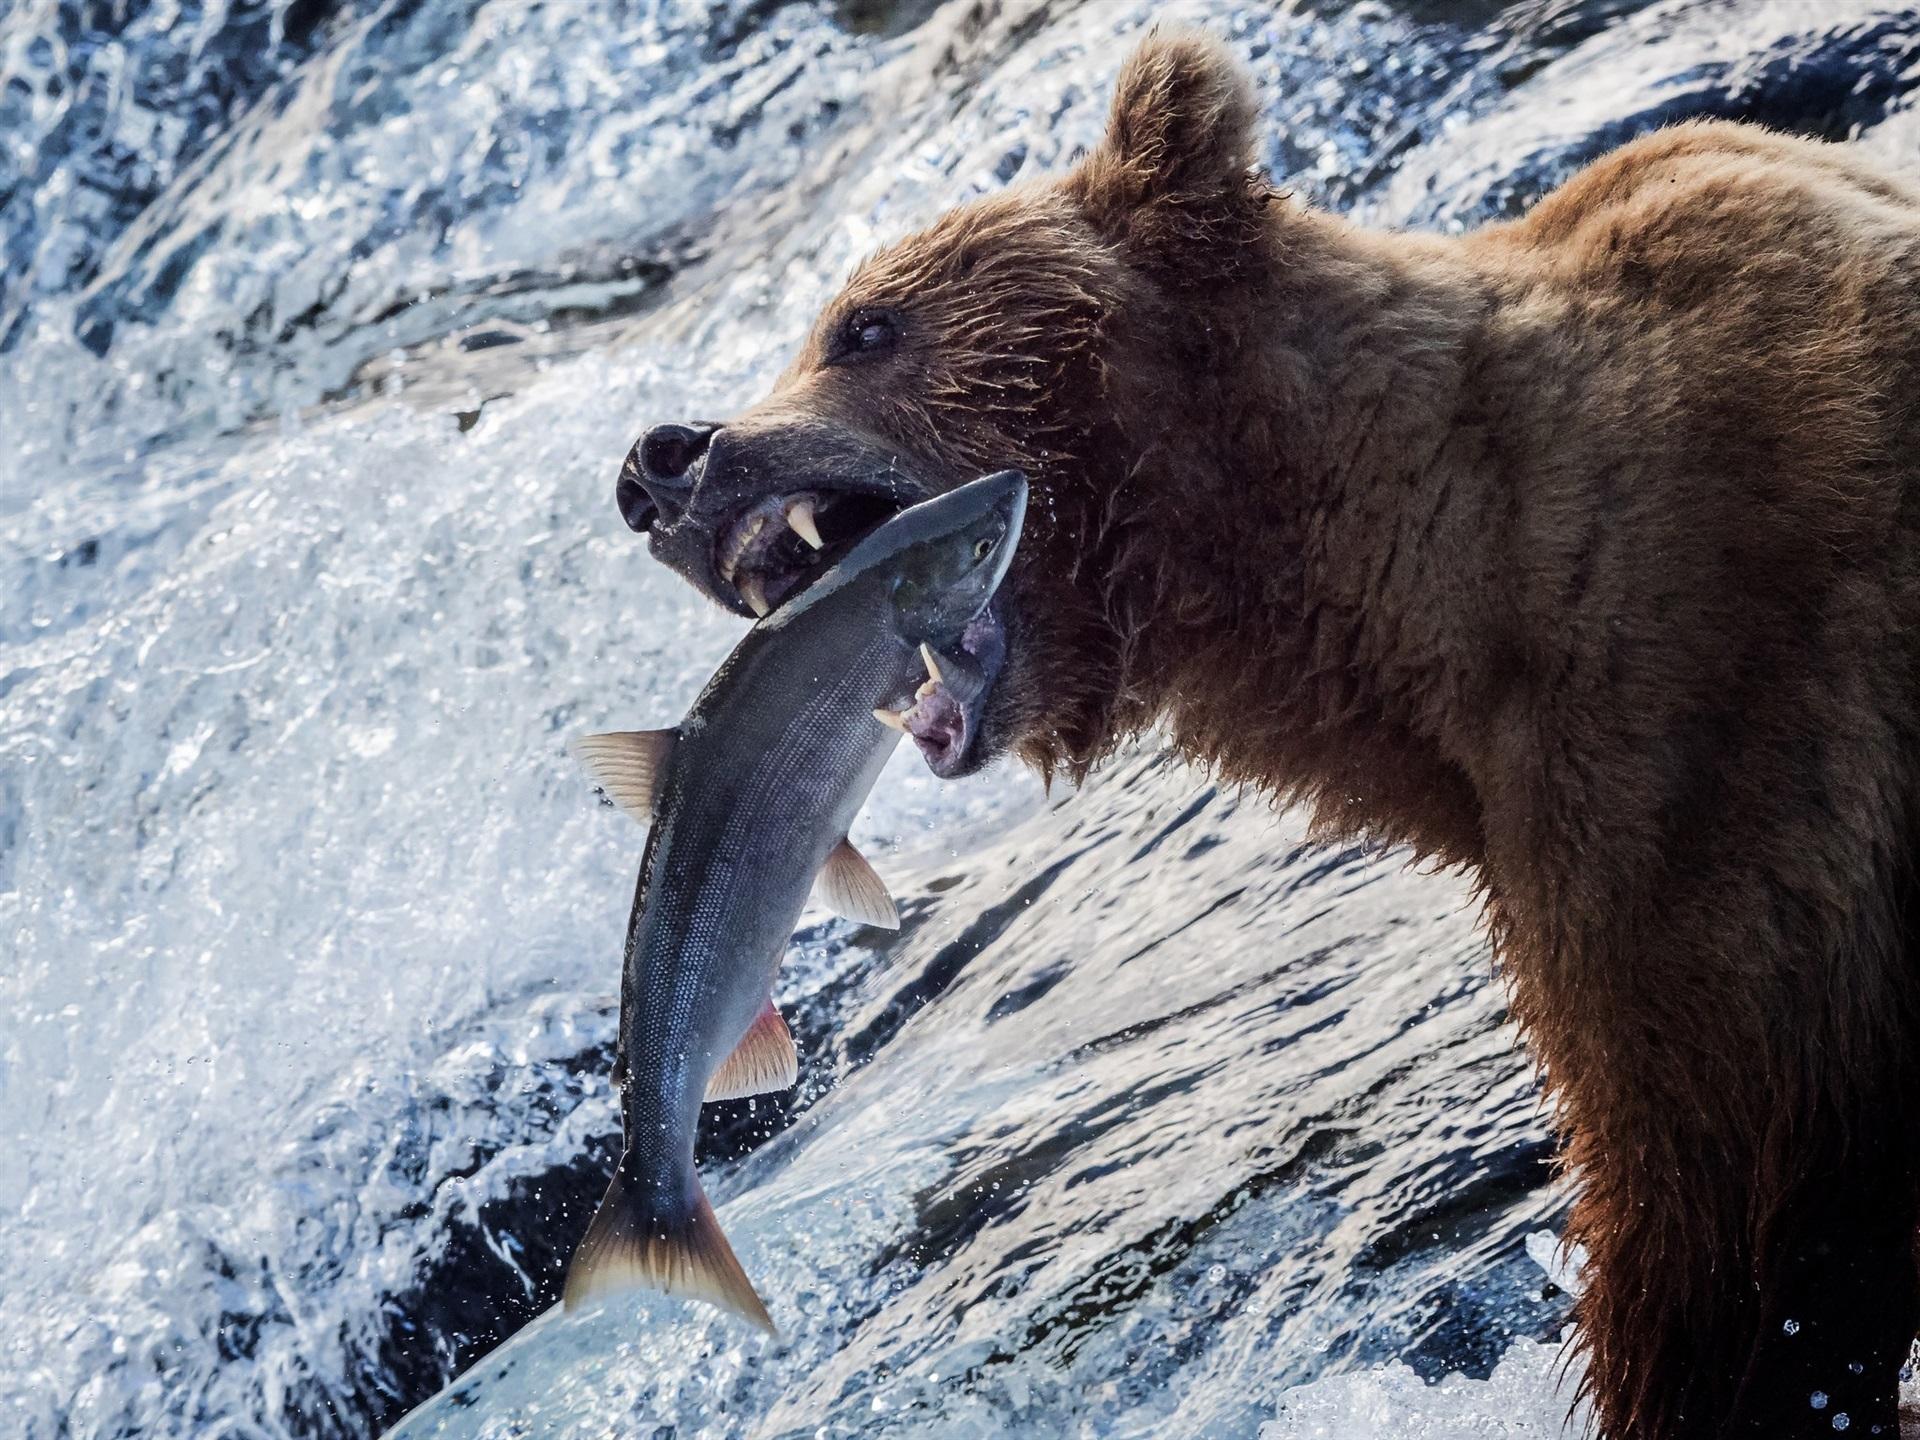 Alaskan Brown Bear Silhouetted Against Mount Katolinat, Alaska  № 1442558 бесплатно